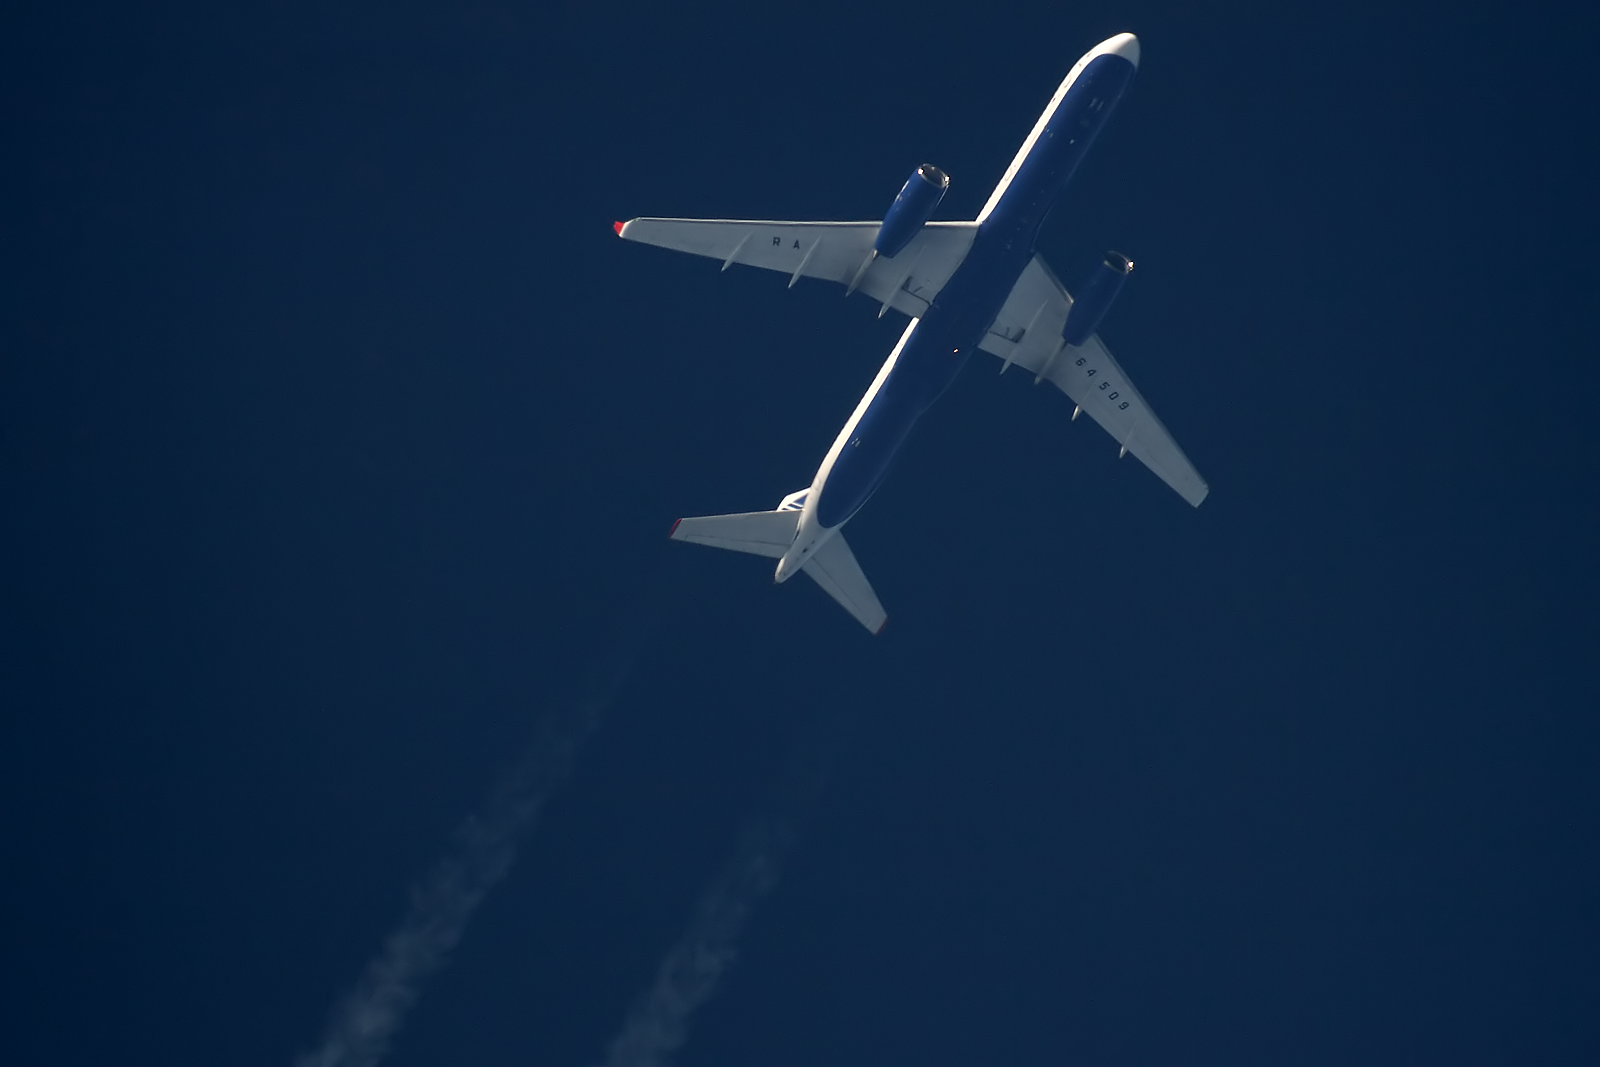 Tu-214 Transaero - RA-64509 - TSO9159 [DME-CFU]